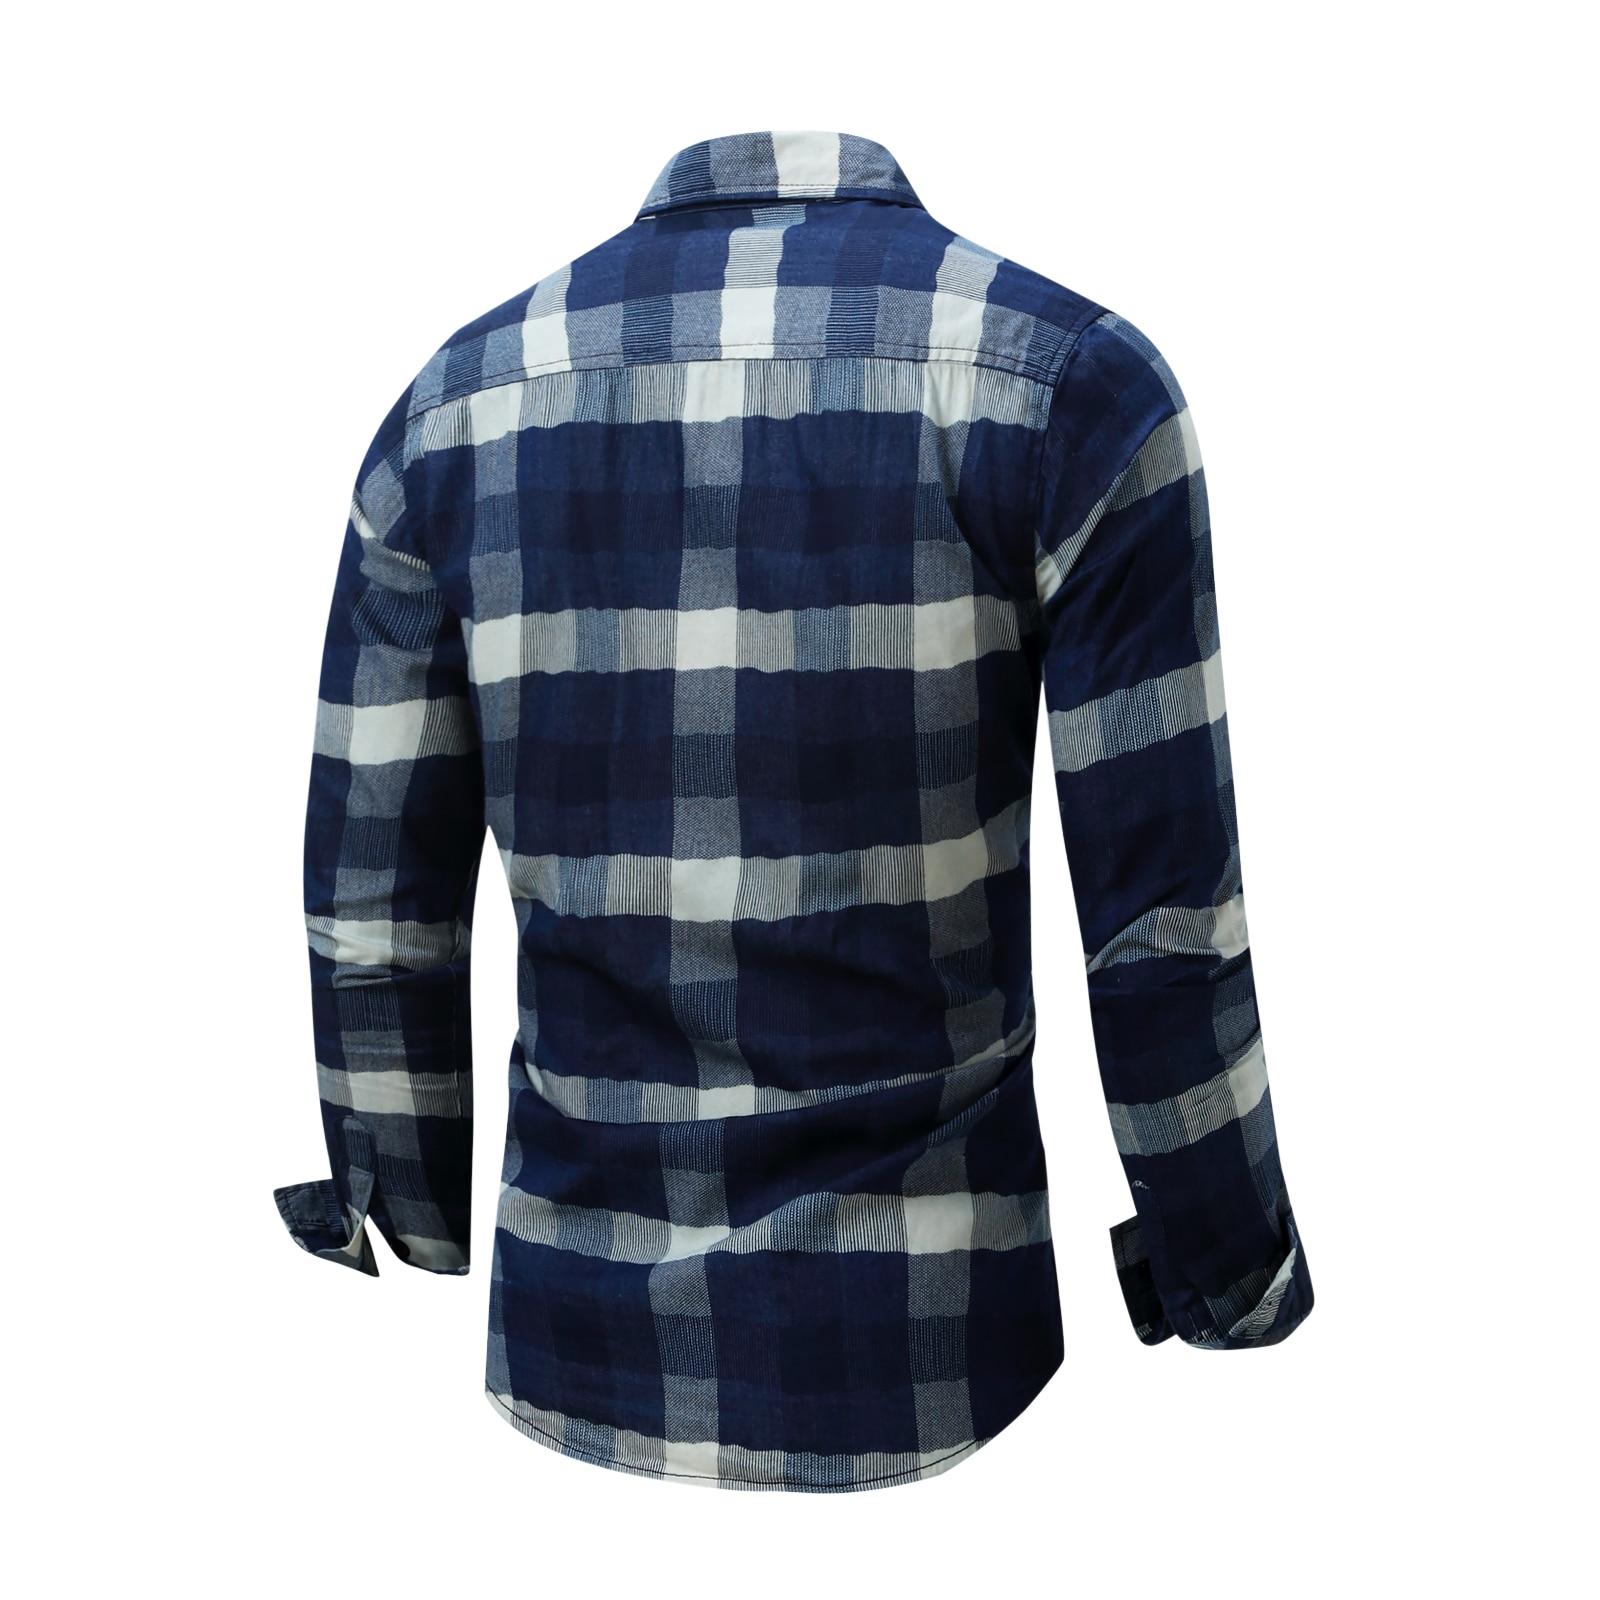 1bc438a6cc1d Fredd Marsha New Casual Shirt Men Plaid Male Shirts Top Slim Fit Long  Sleeve Plaid Cuff Spring Autumn Camisa Masculina